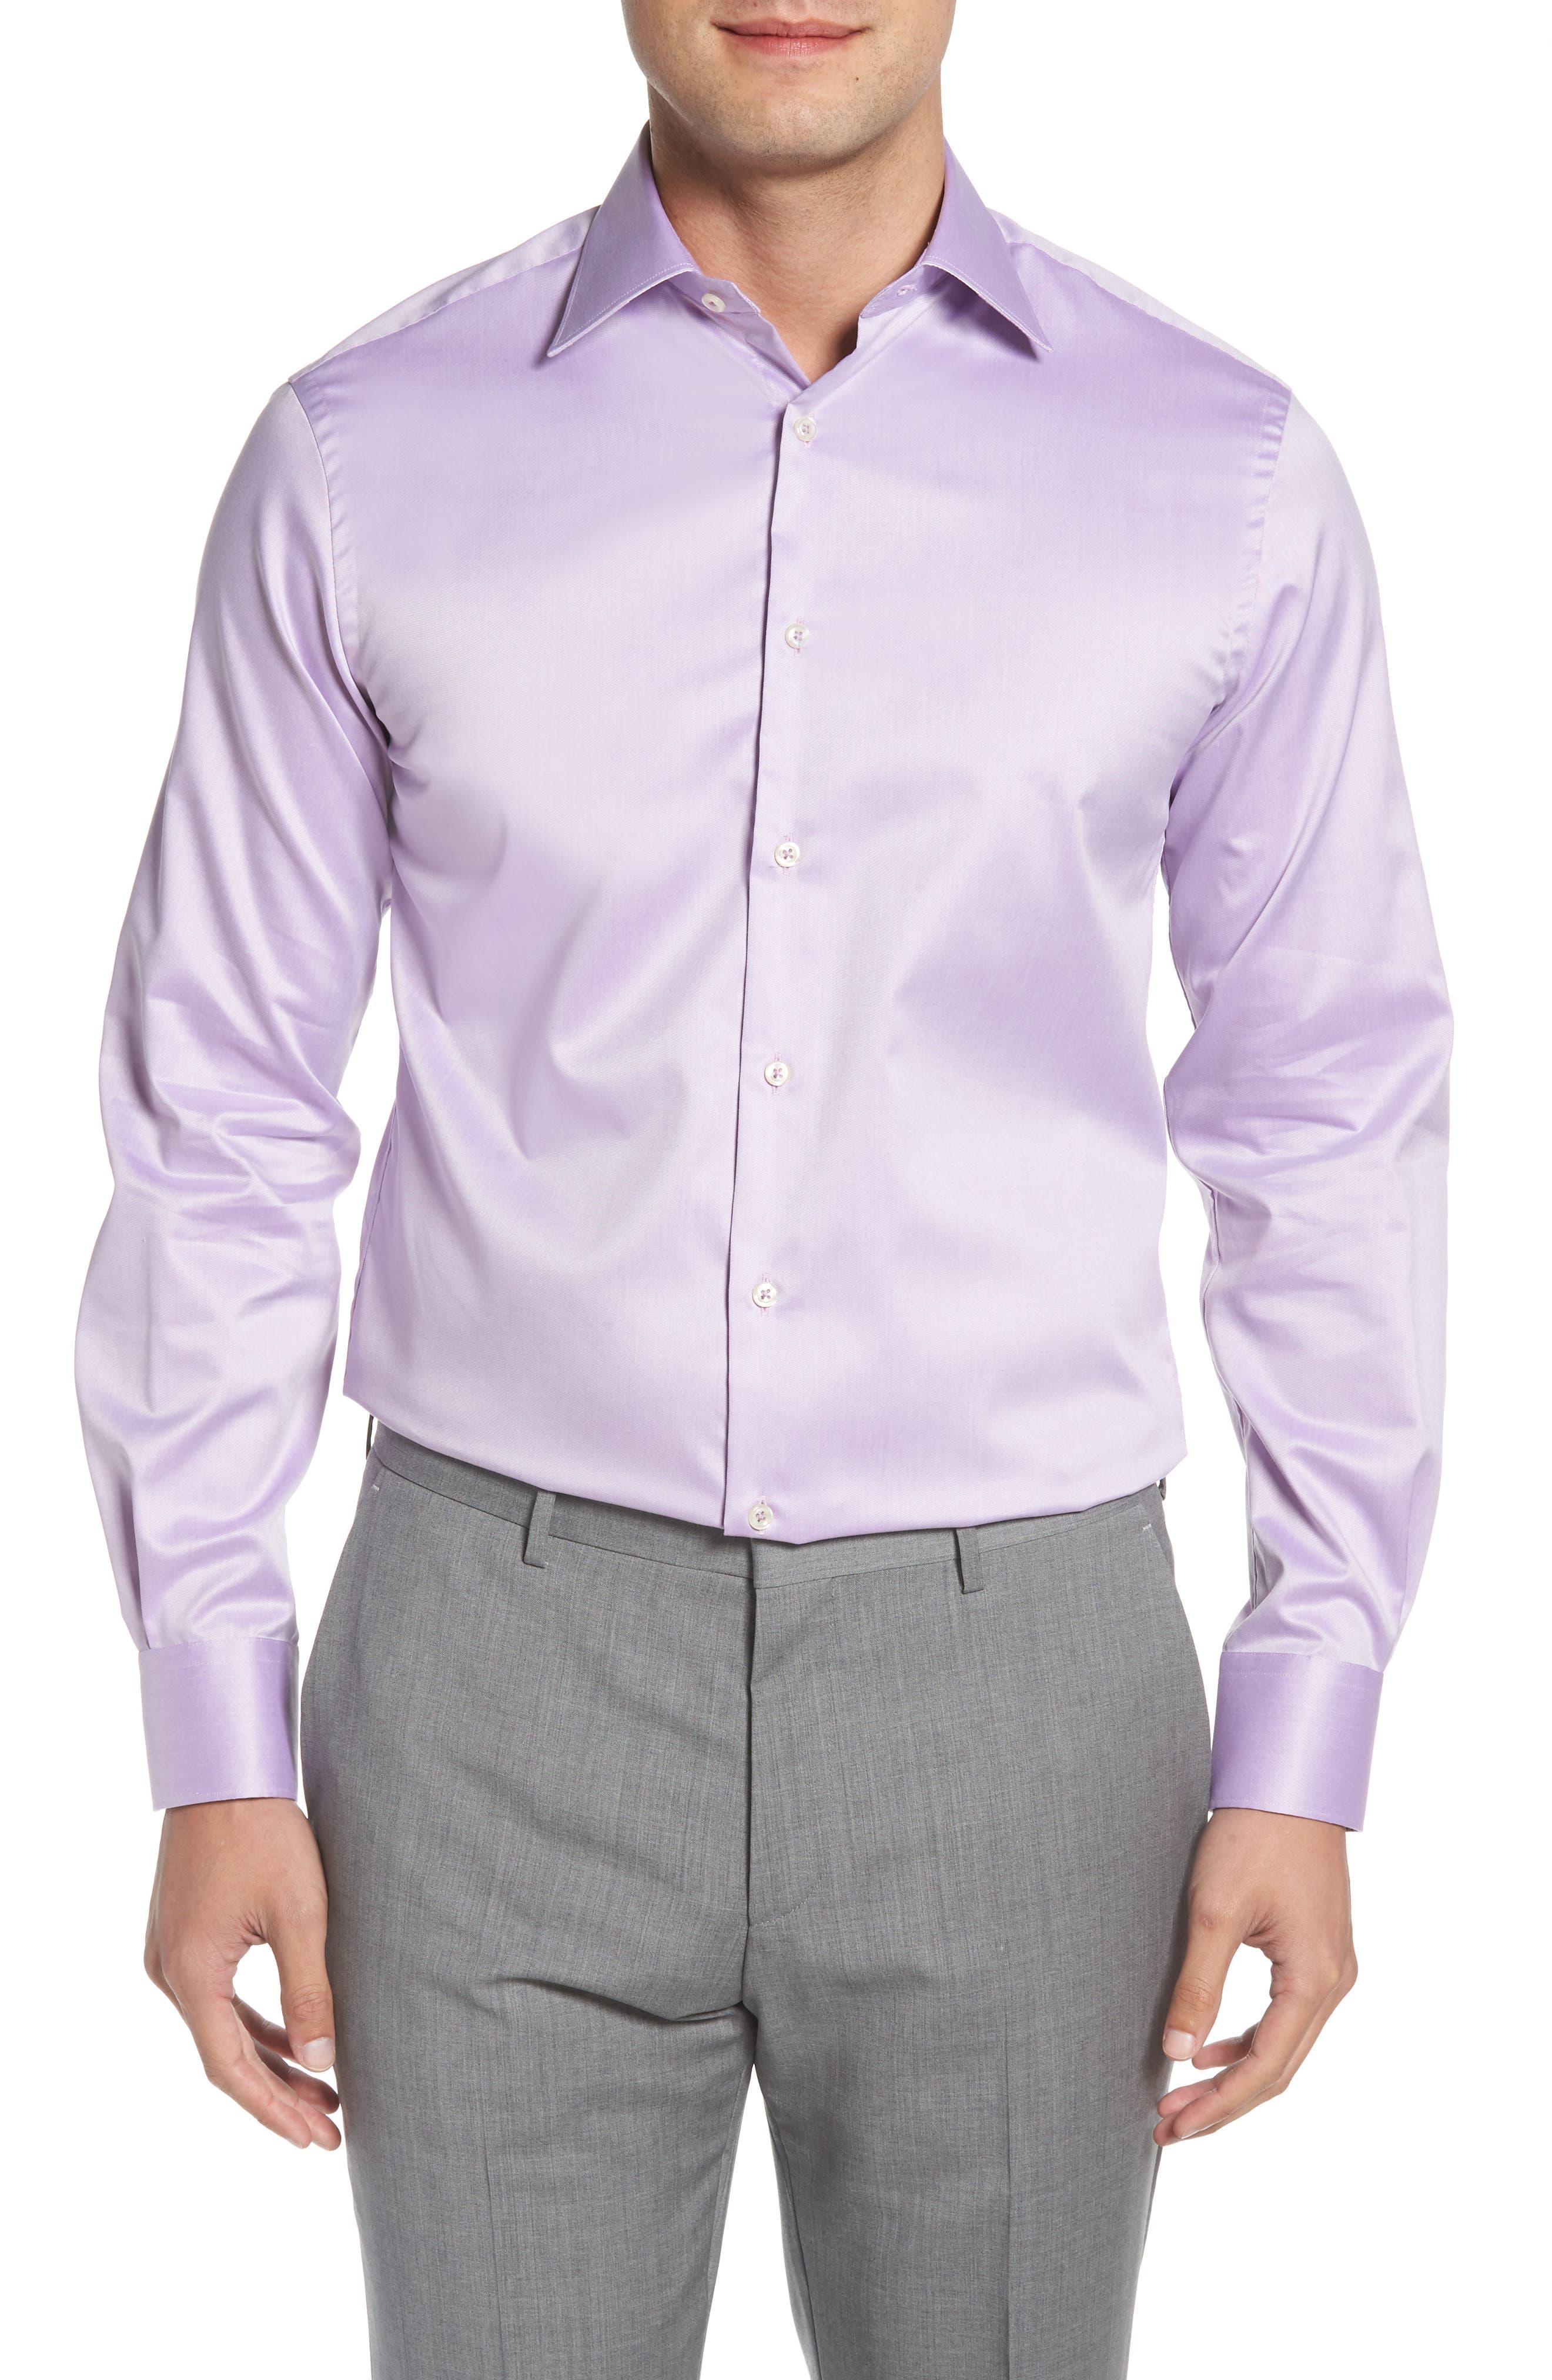 Regular Fit Solid Dress Shirt,                         Main,                         color, PURPLE